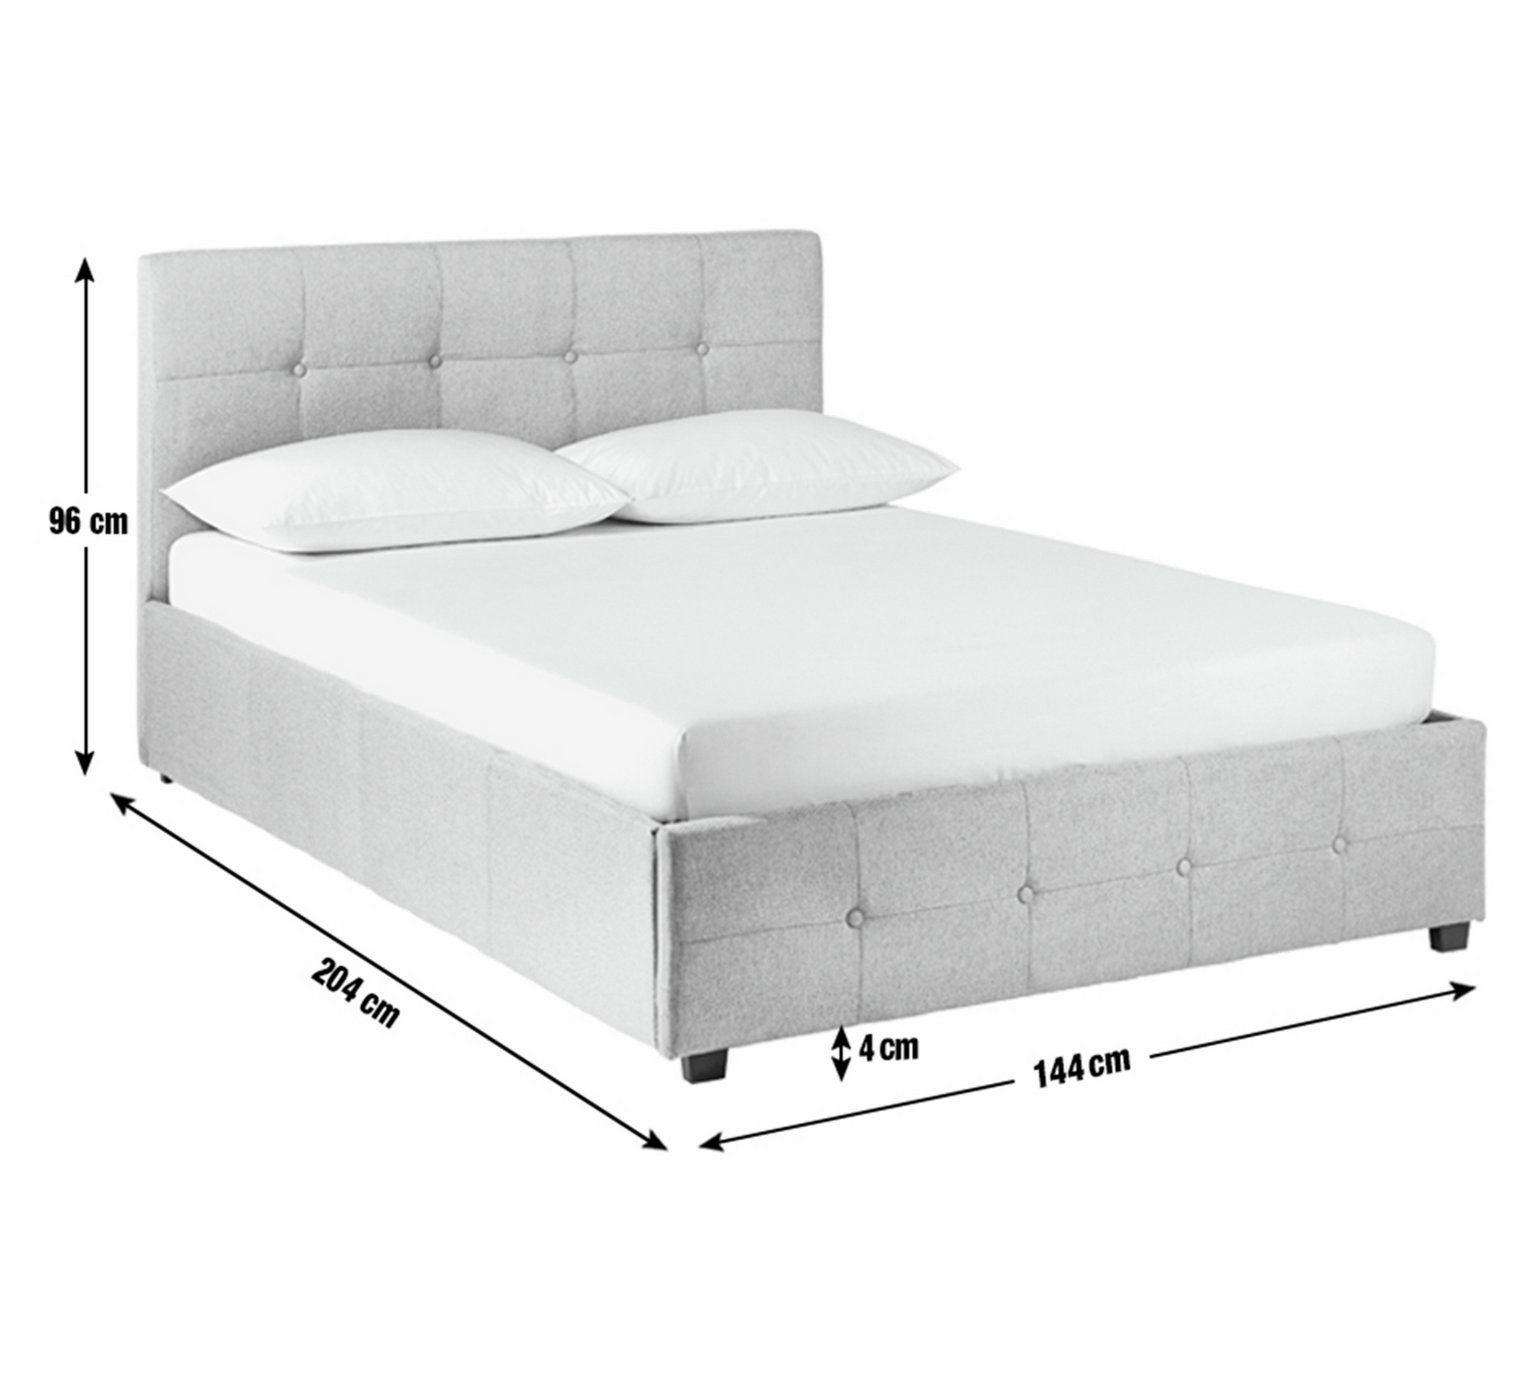 Phenomenal Home Eros Ottoman Double Bed Frame Grey Spare Room Creativecarmelina Interior Chair Design Creativecarmelinacom